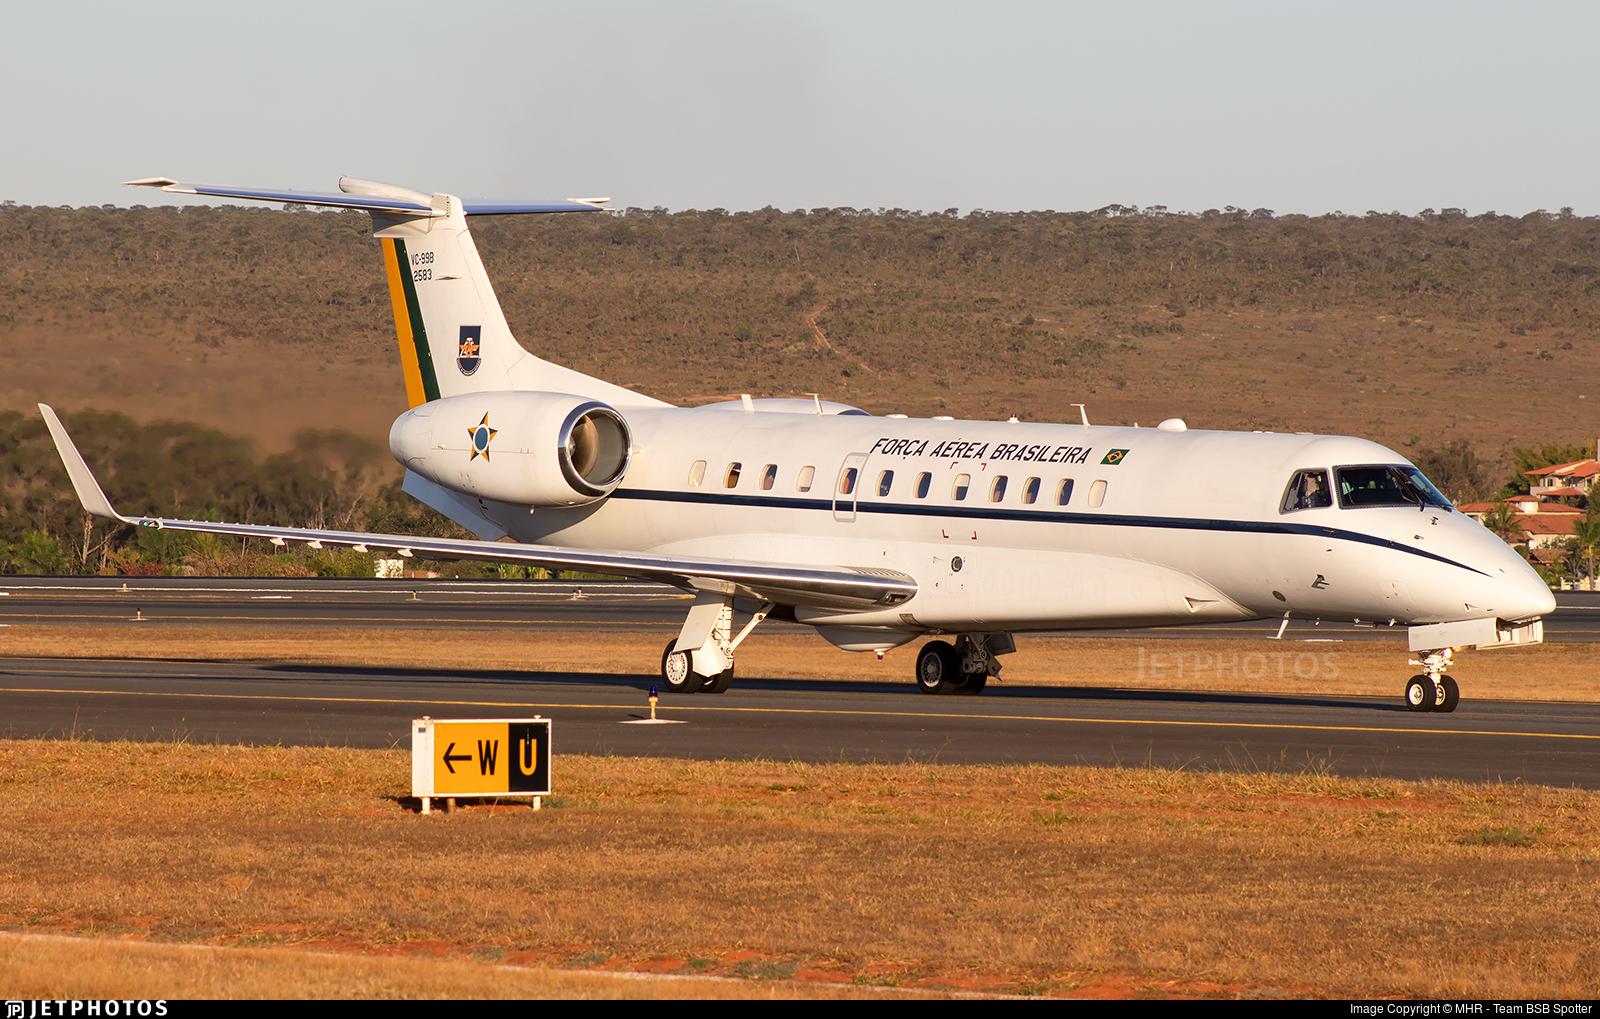 FAB2583 - Embraer VC-99B - Brazil - Air Force